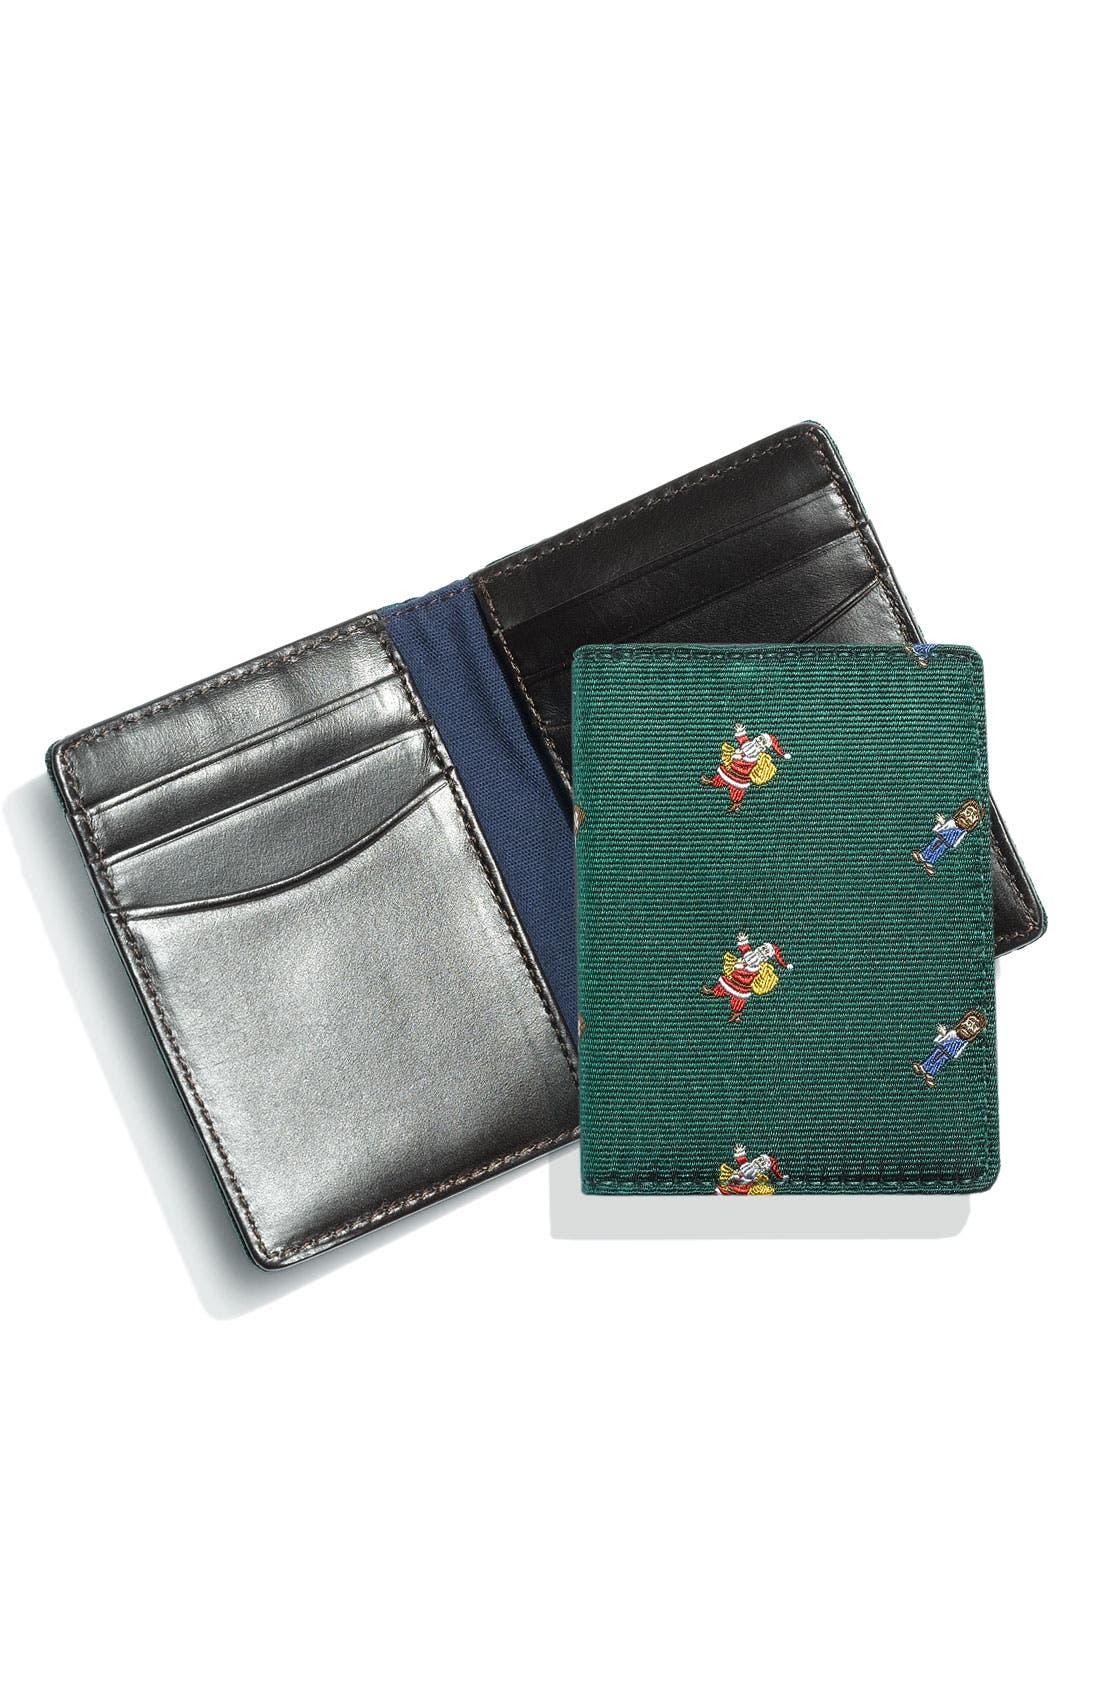 JACK SPADE, 'Silk Club' Vertical Wallet, Main thumbnail 1, color, 960